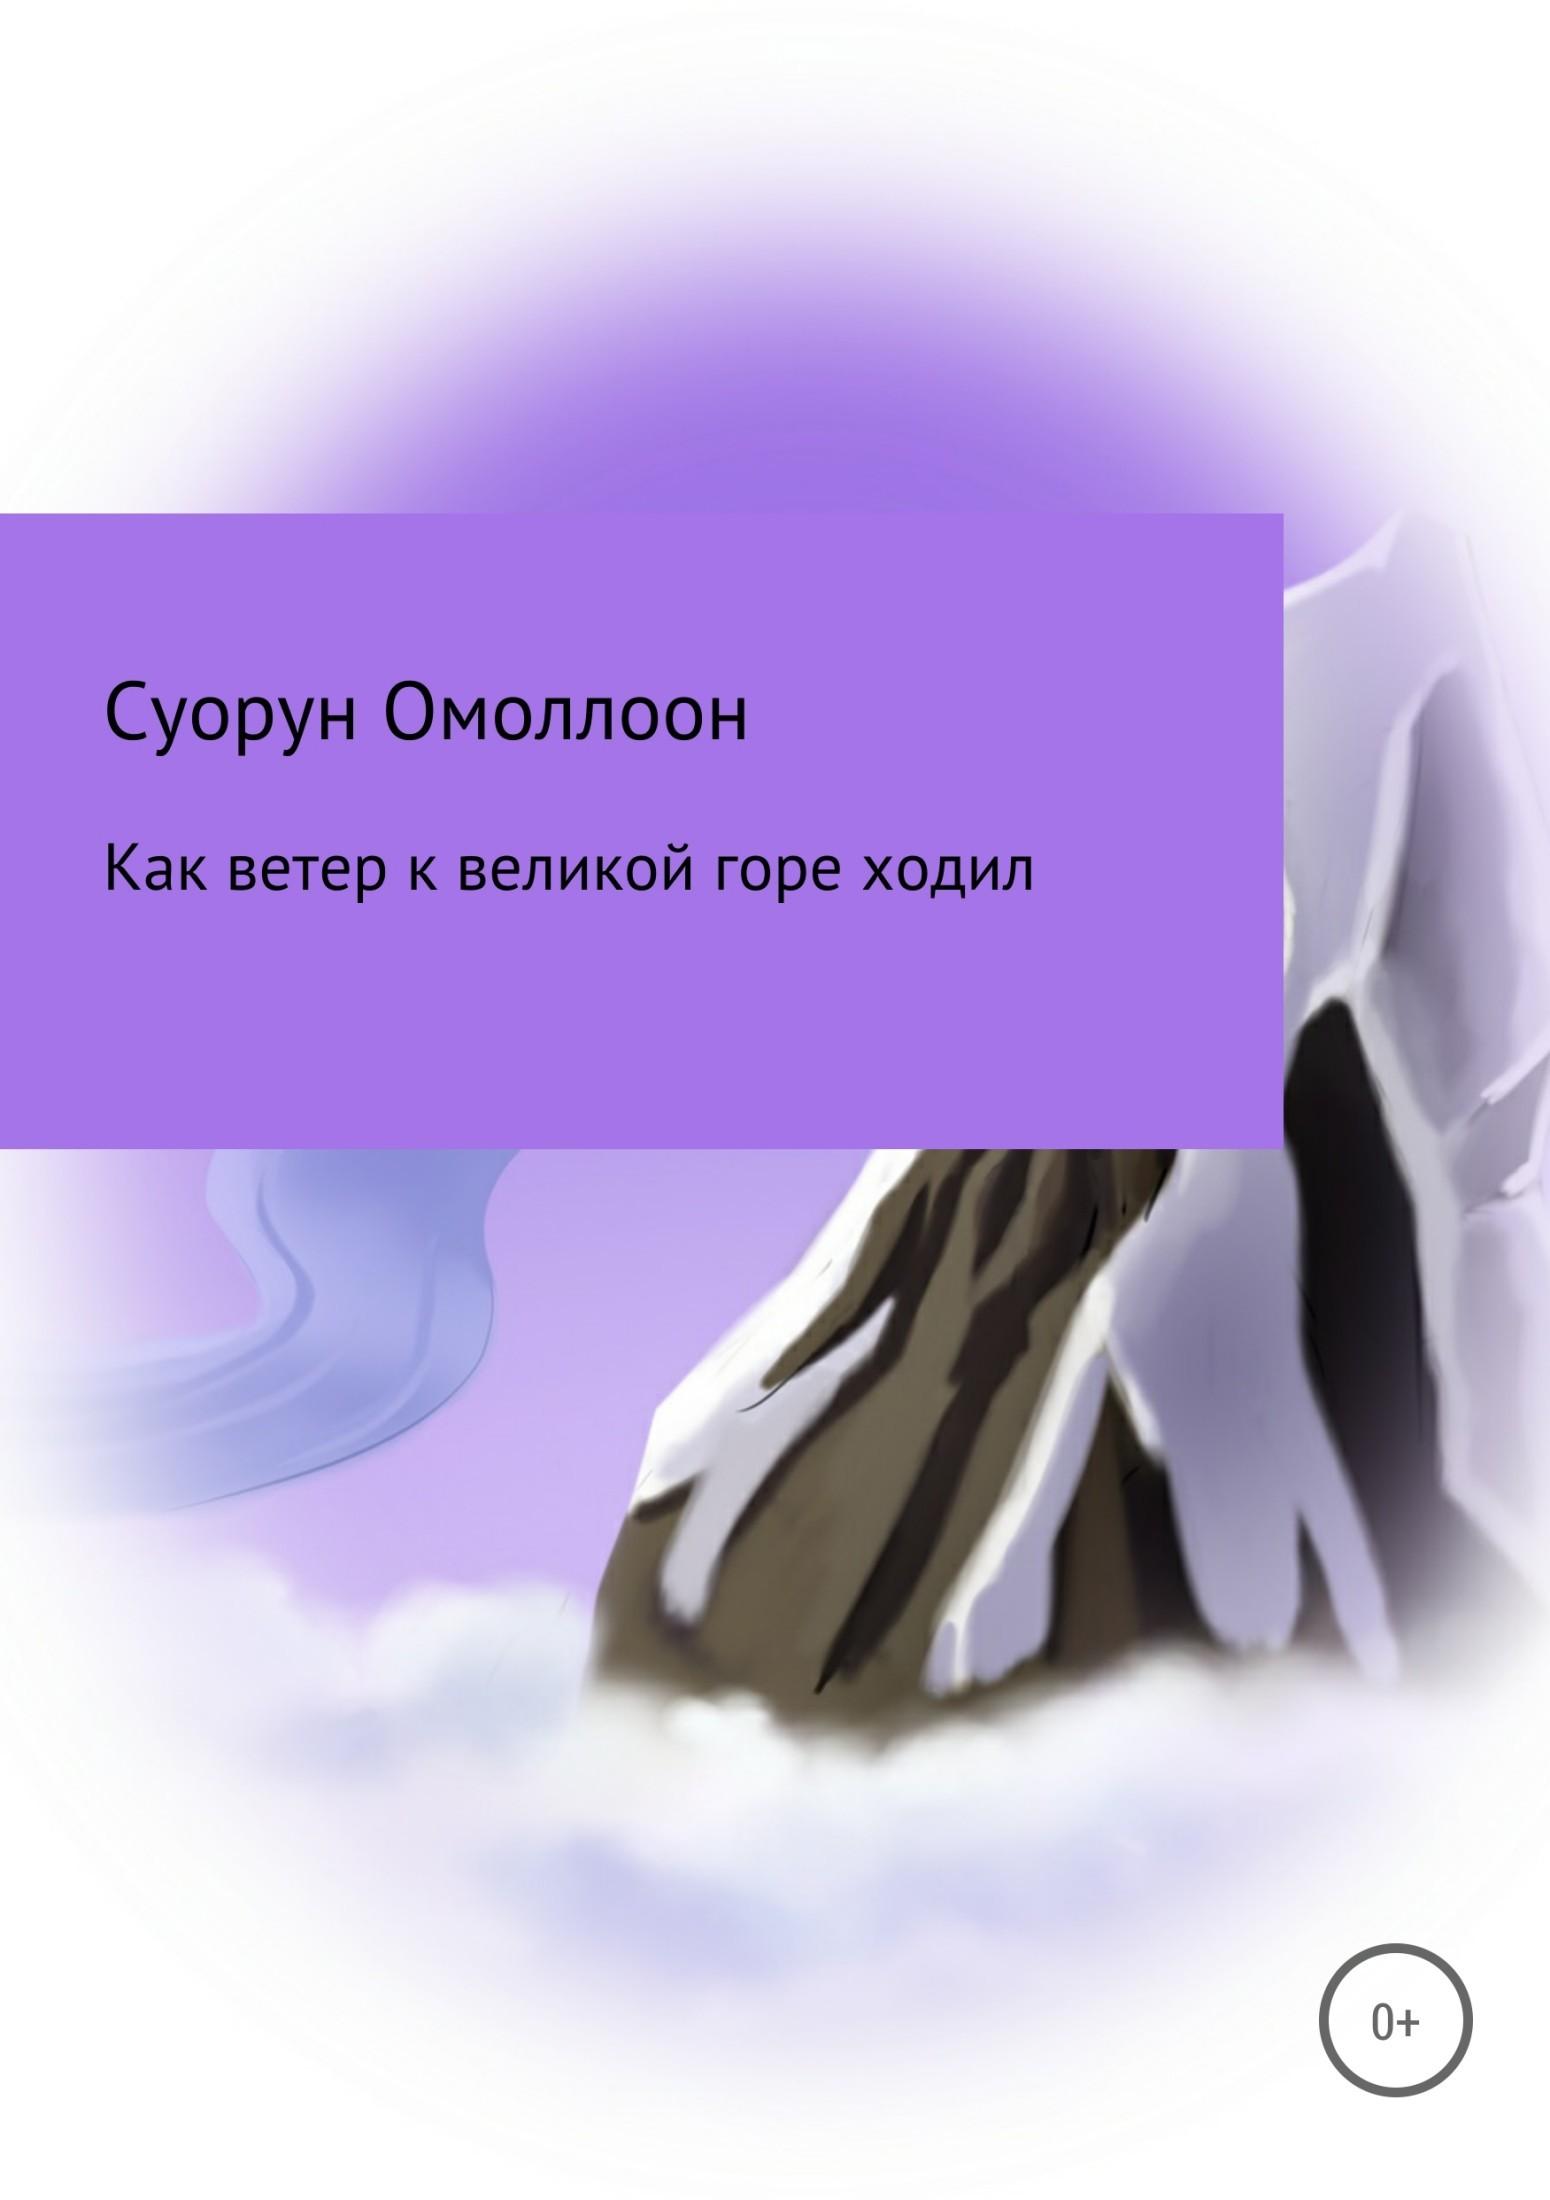 Дмитрий Кононович Сивцев – Суорун Омоллоон. Как ветер к великой горе ходил